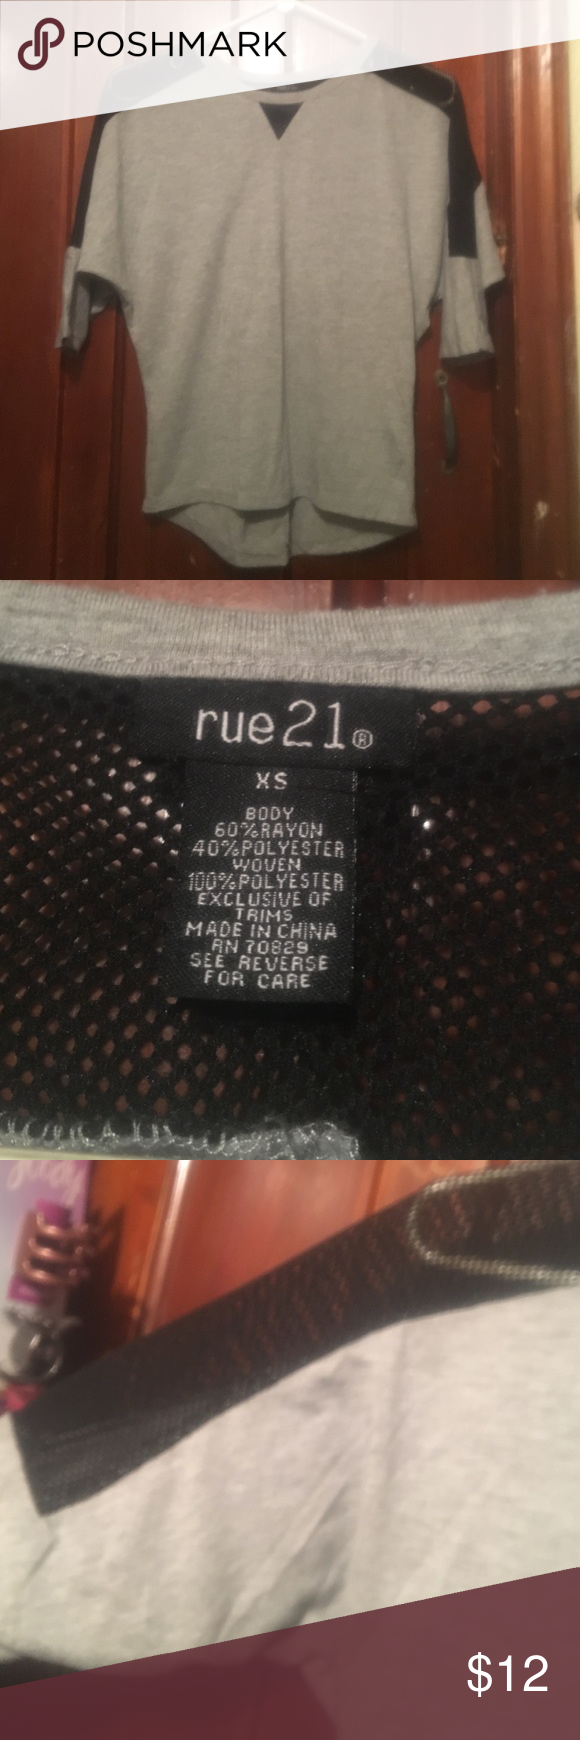 Rue 21 3/4 sleeve shirt Gray with mesh , 3/4 sleeve size xs Rue 21 Tops Tees - Long Sleeve